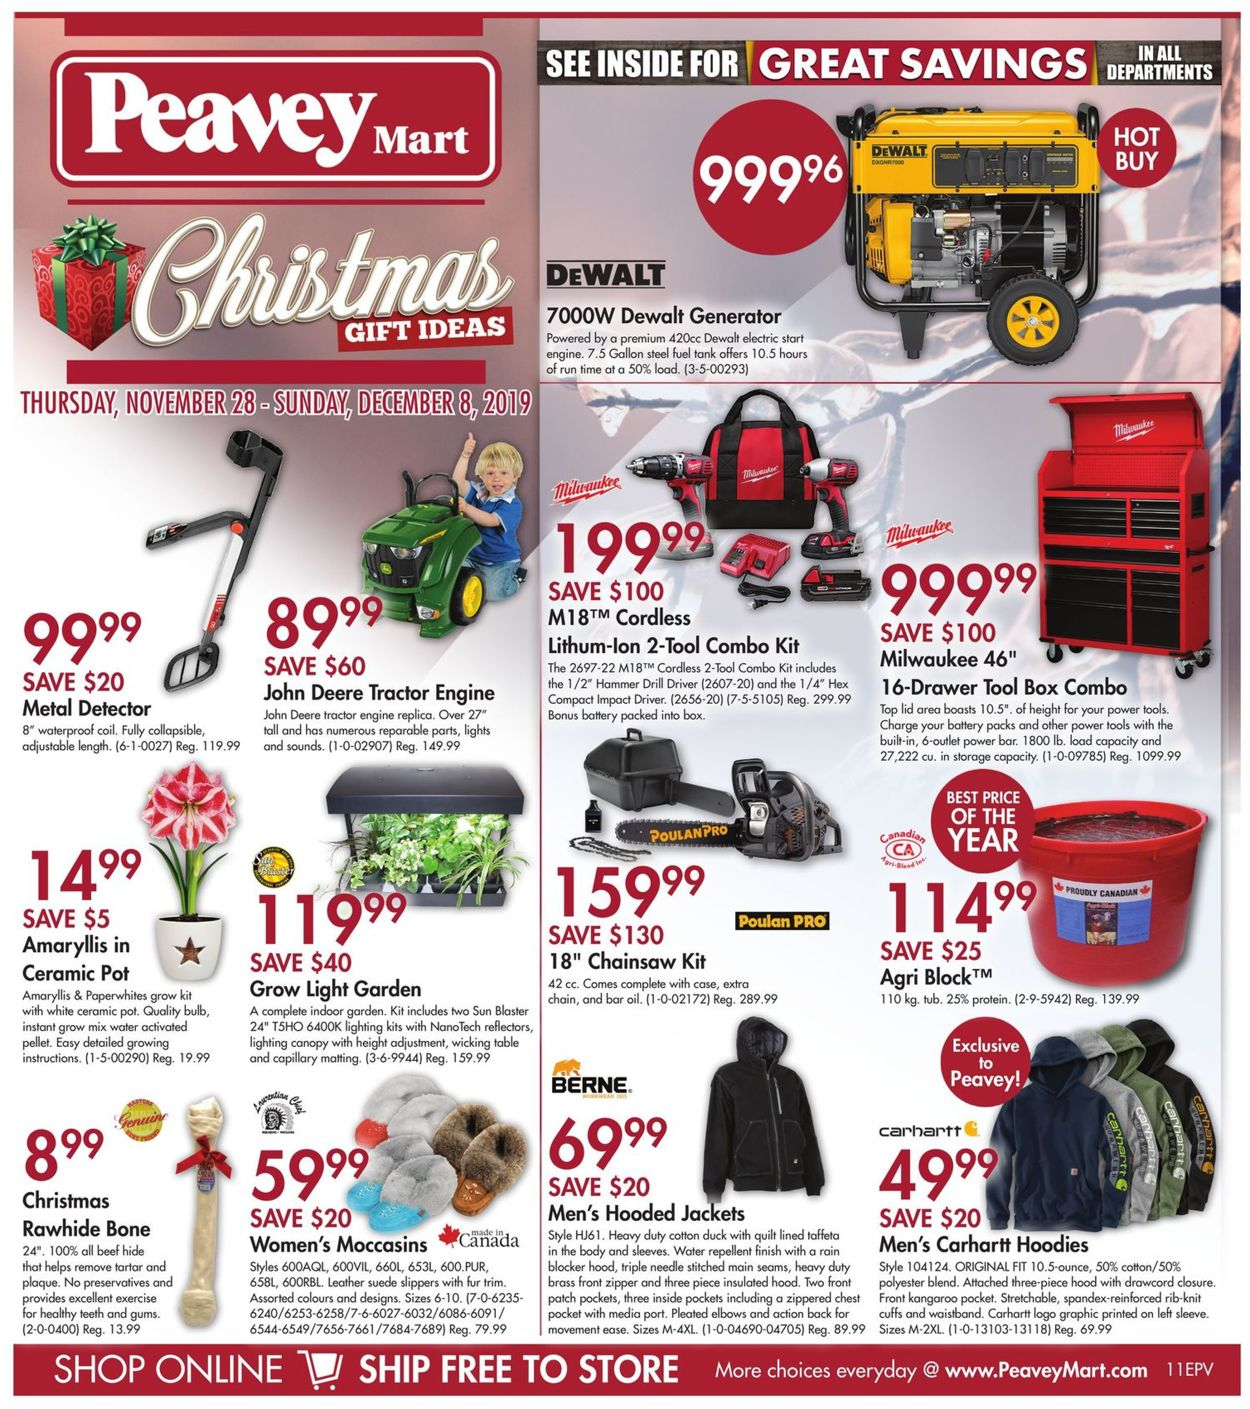 Peavey Mart CHRISTMAS GIFT IDEAS 2019